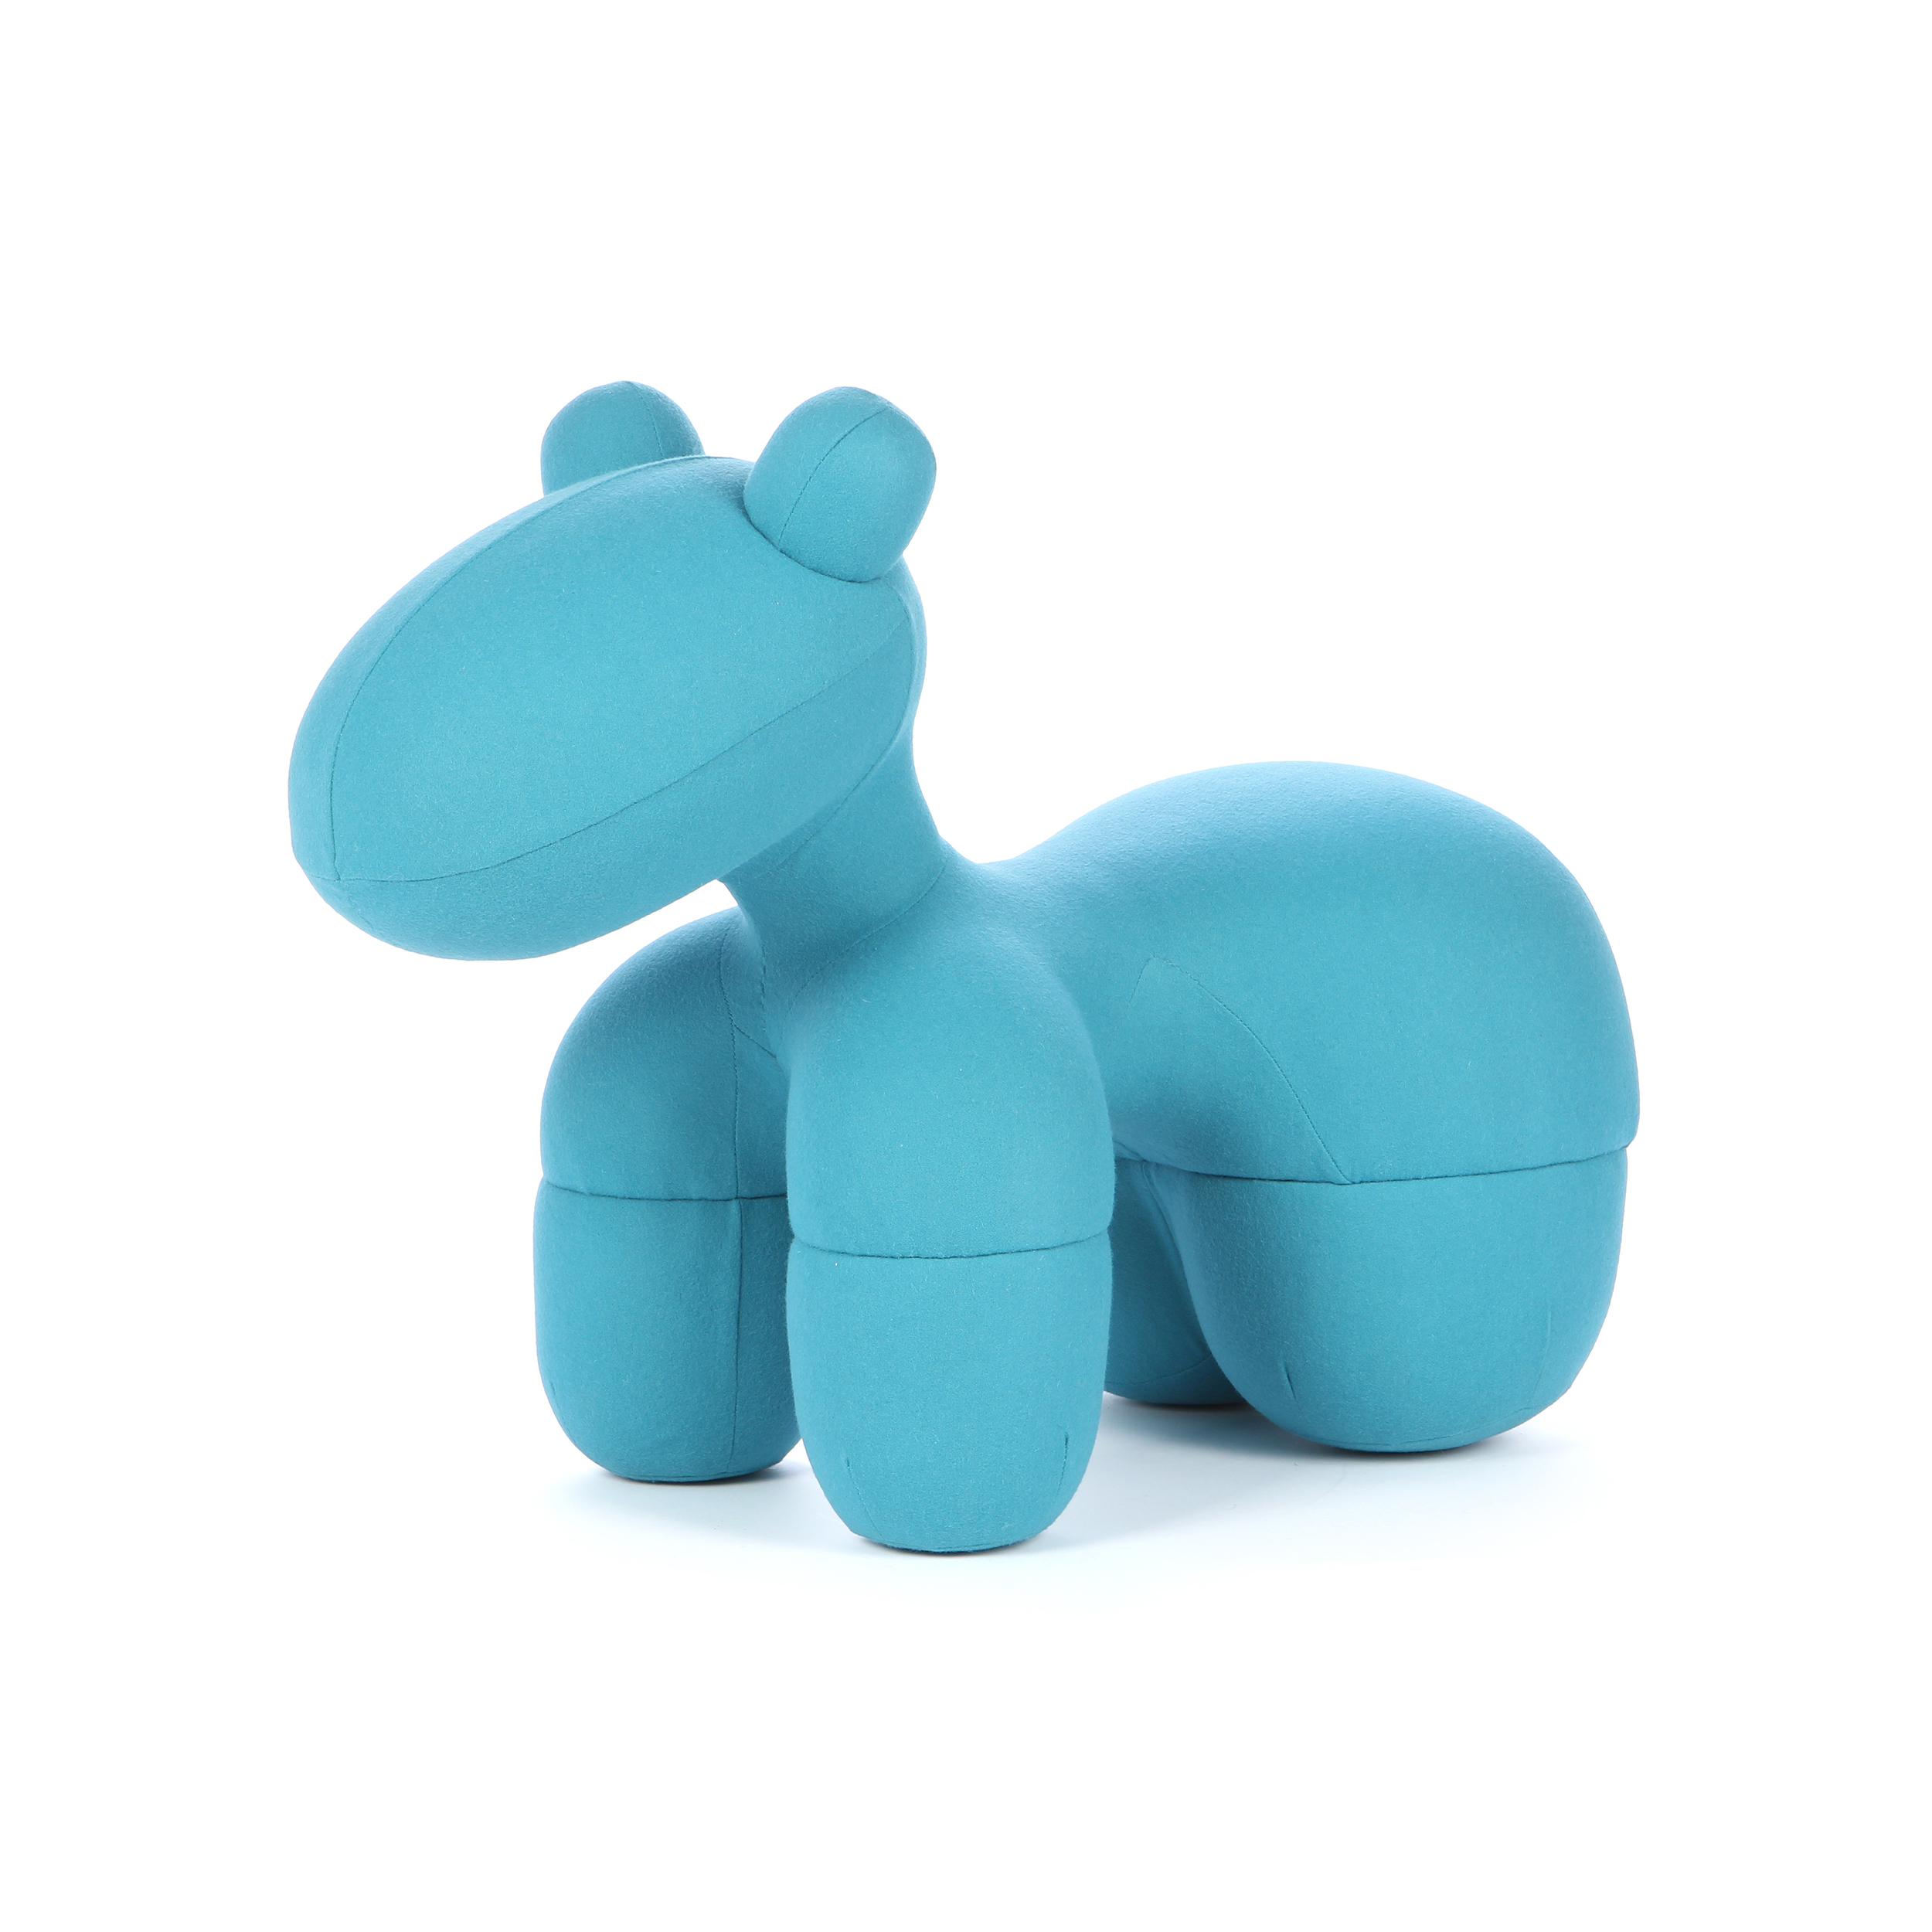 Кресло PonyМебель для детей<br><br><br>stock: 5<br>Высота: 76<br>Ширина: 57<br>Глубина: 110<br>Материал каркаса: Кашемир<br>Тип материала каркаса: Ткань<br>Цвет каркаса: Голубой